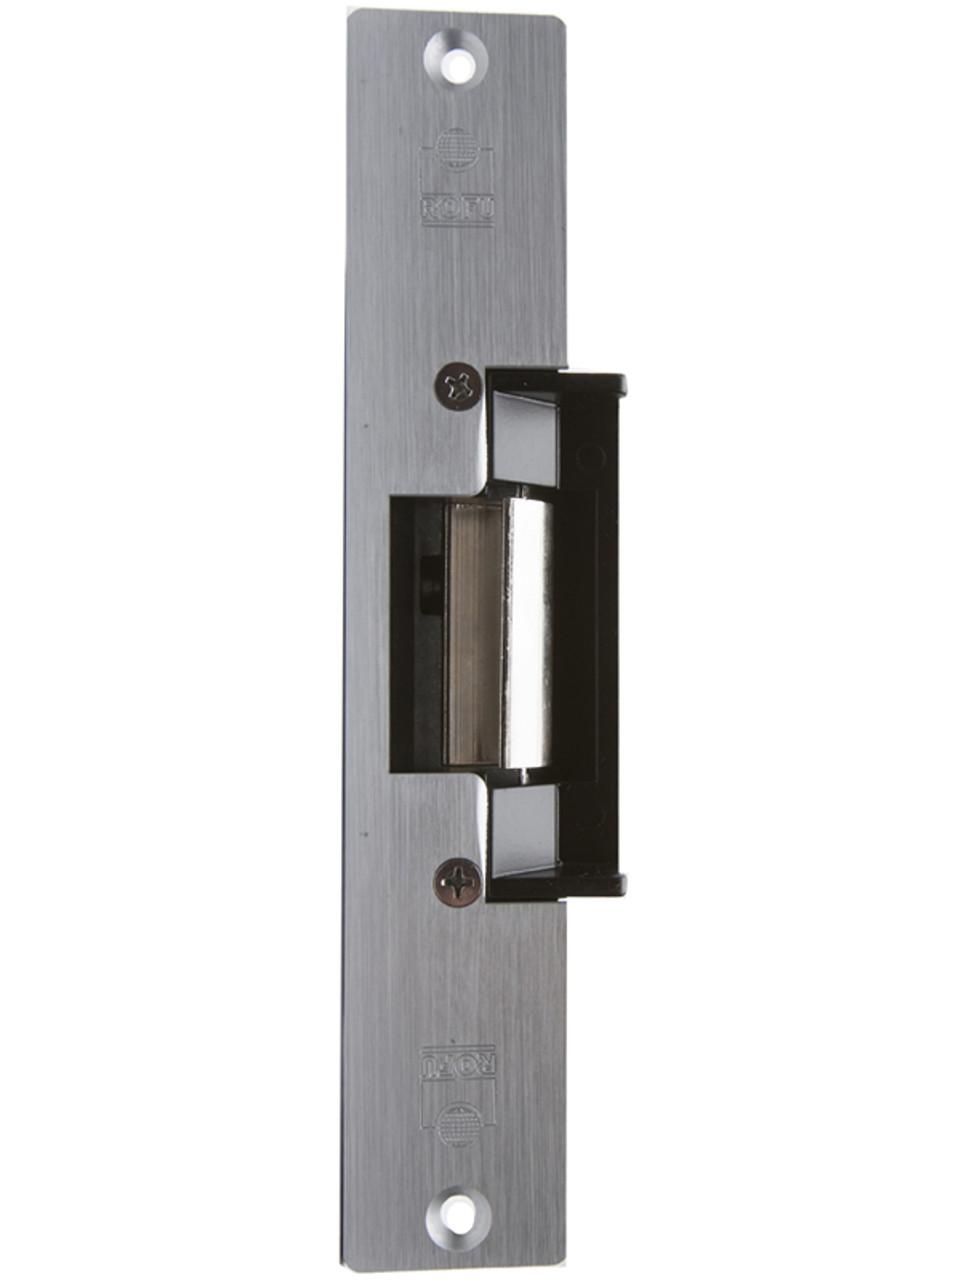 Rofu 1404 Series 1404 08 Fail Secure Electric Strike